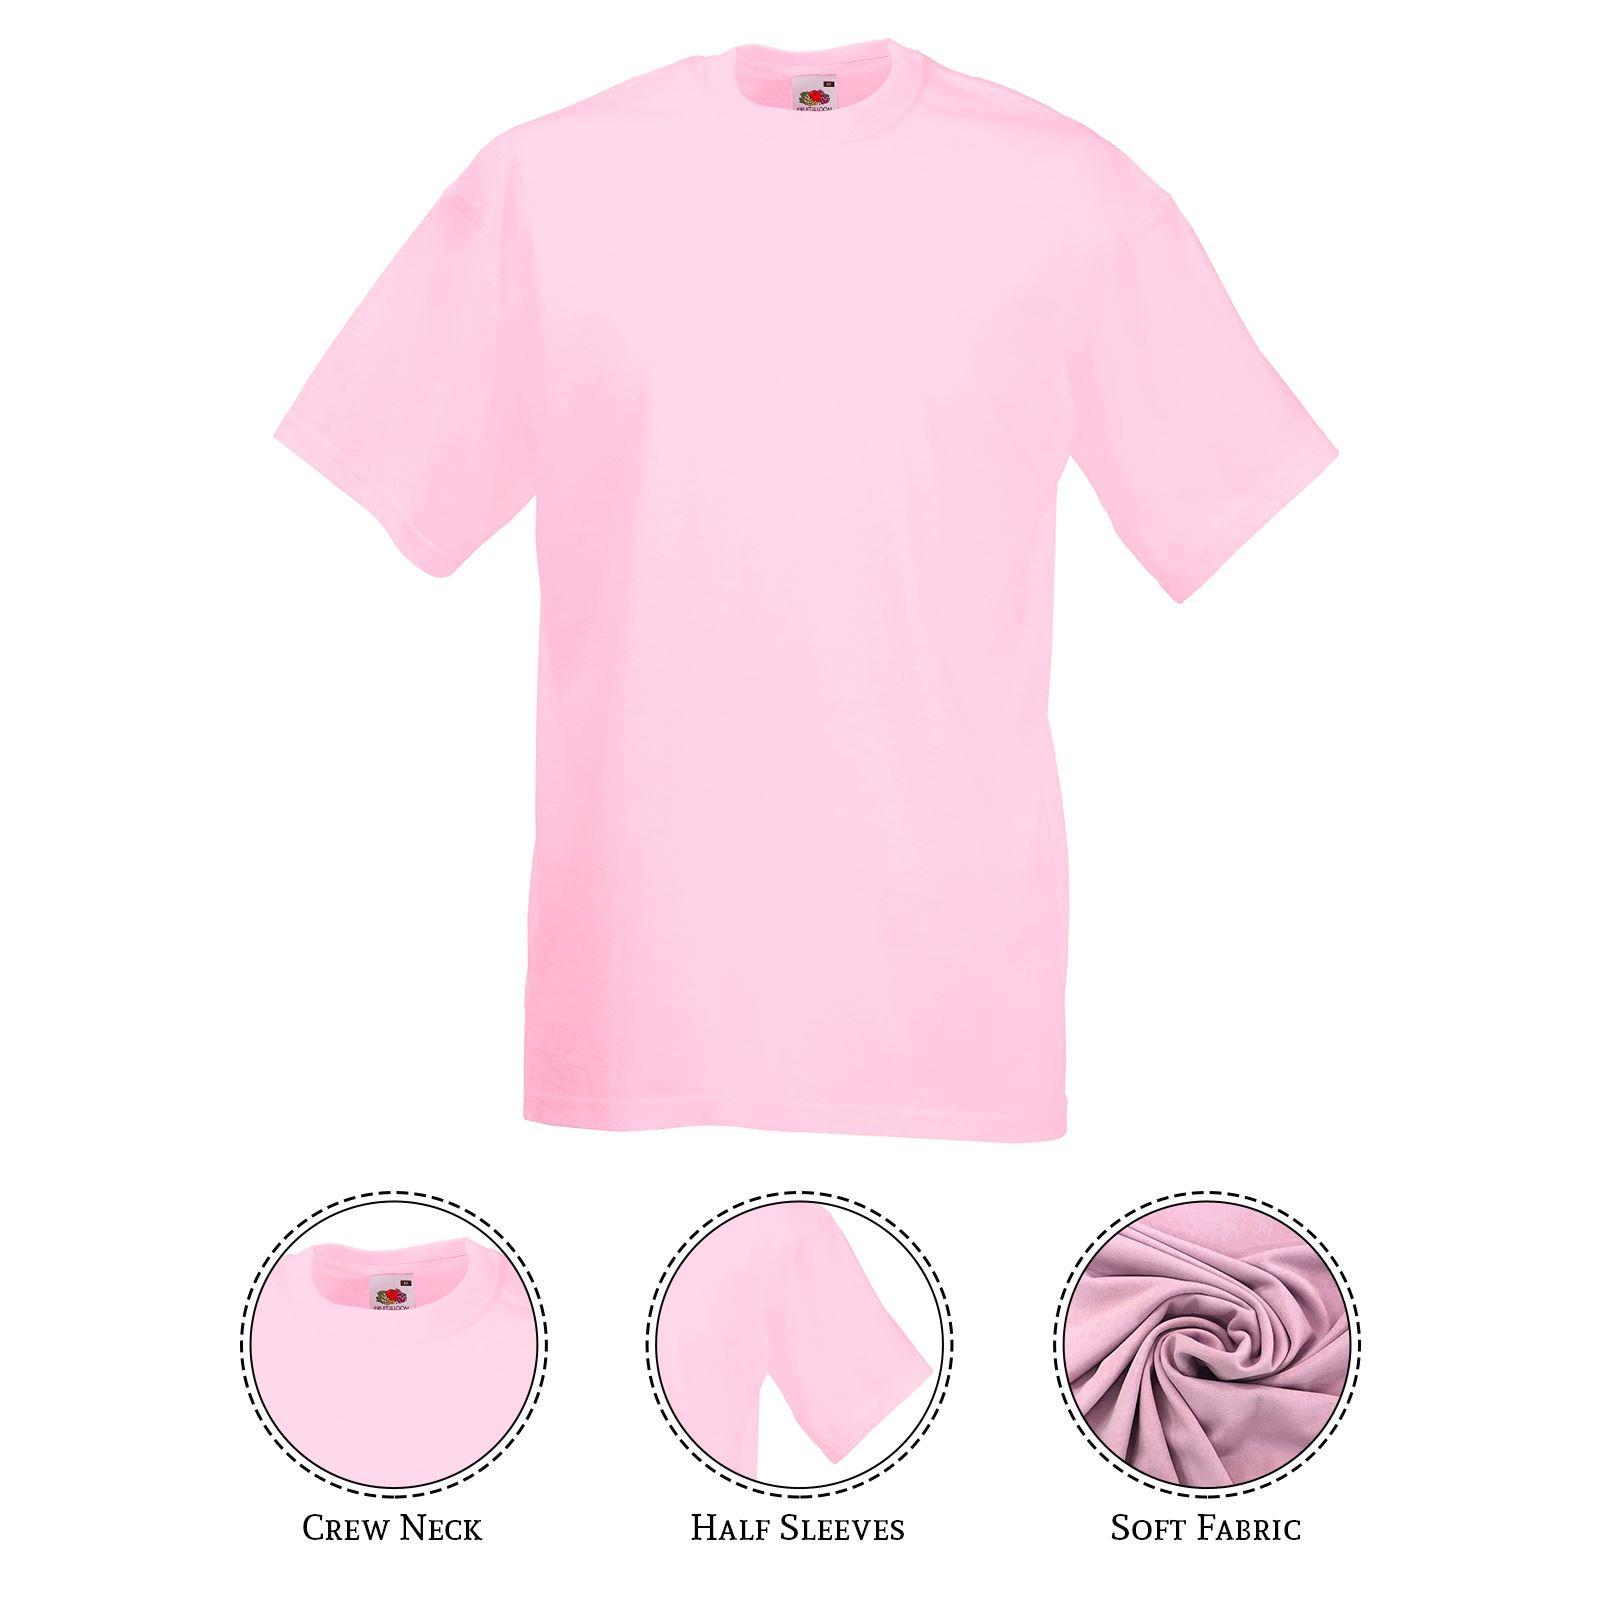 thumbnail 35 - Men-s-Fruit-Of-The-Loom-T-Shirt-Original-100-Cotton-Casual-Plain-Top-Tee